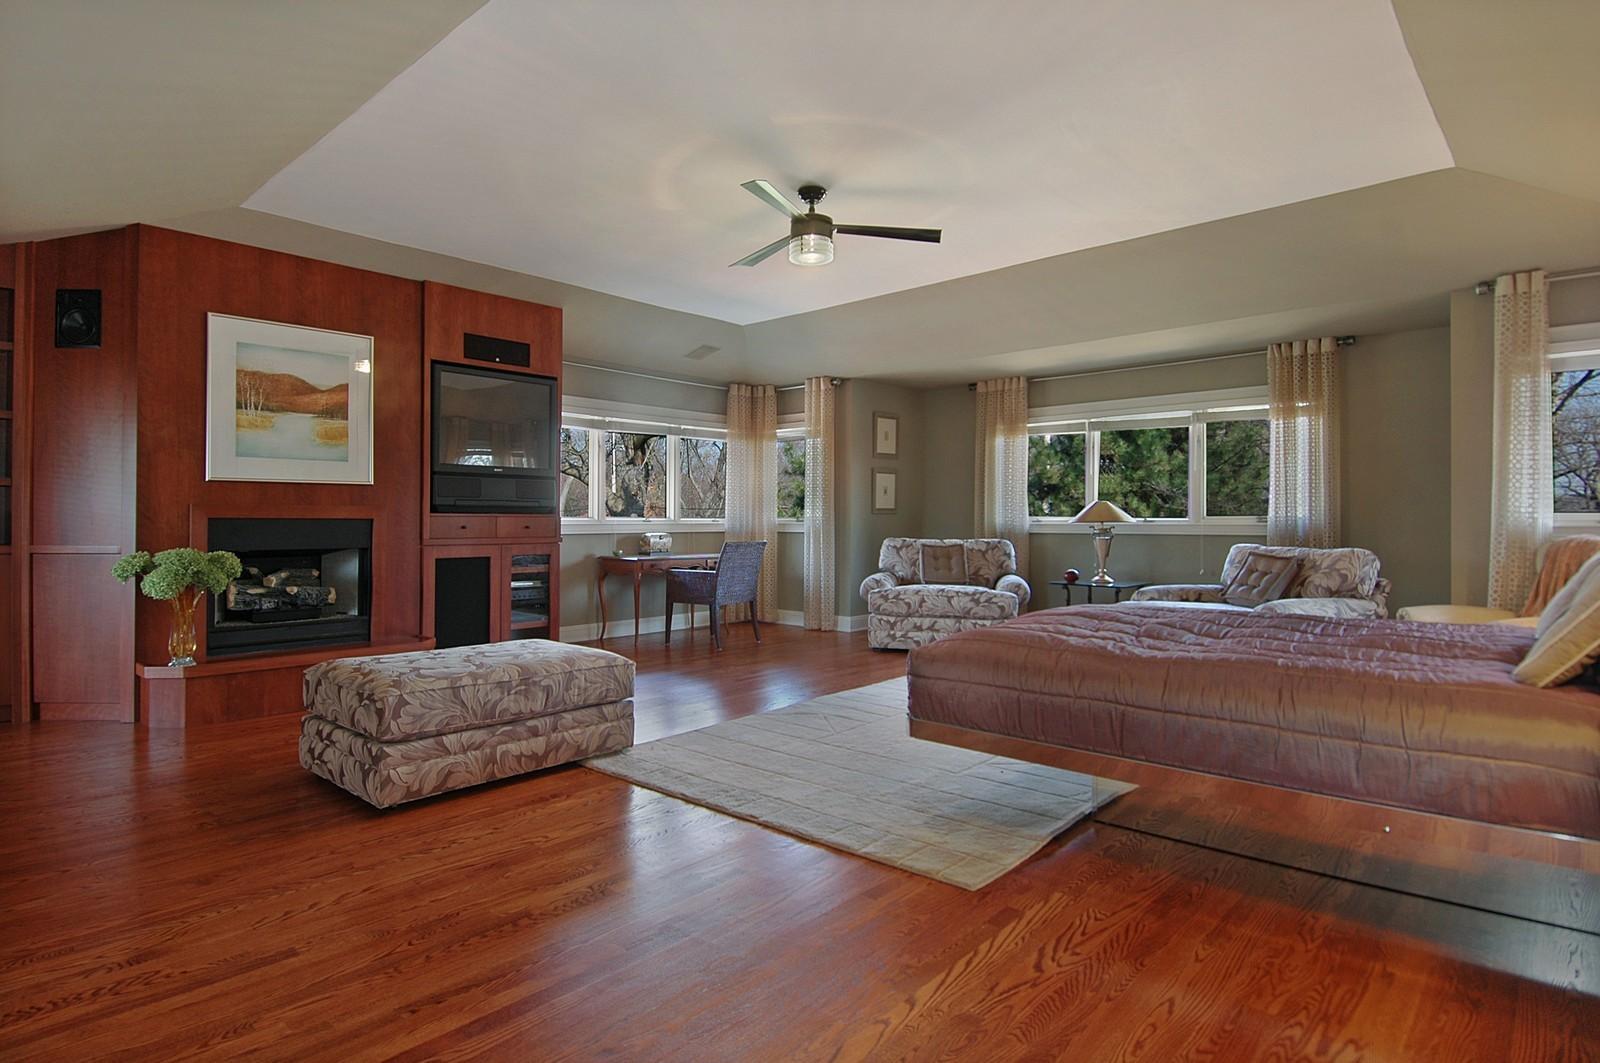 Real Estate Photography - 751 Lake, Crystal Lake, IL, 60014 - Master Bedroom